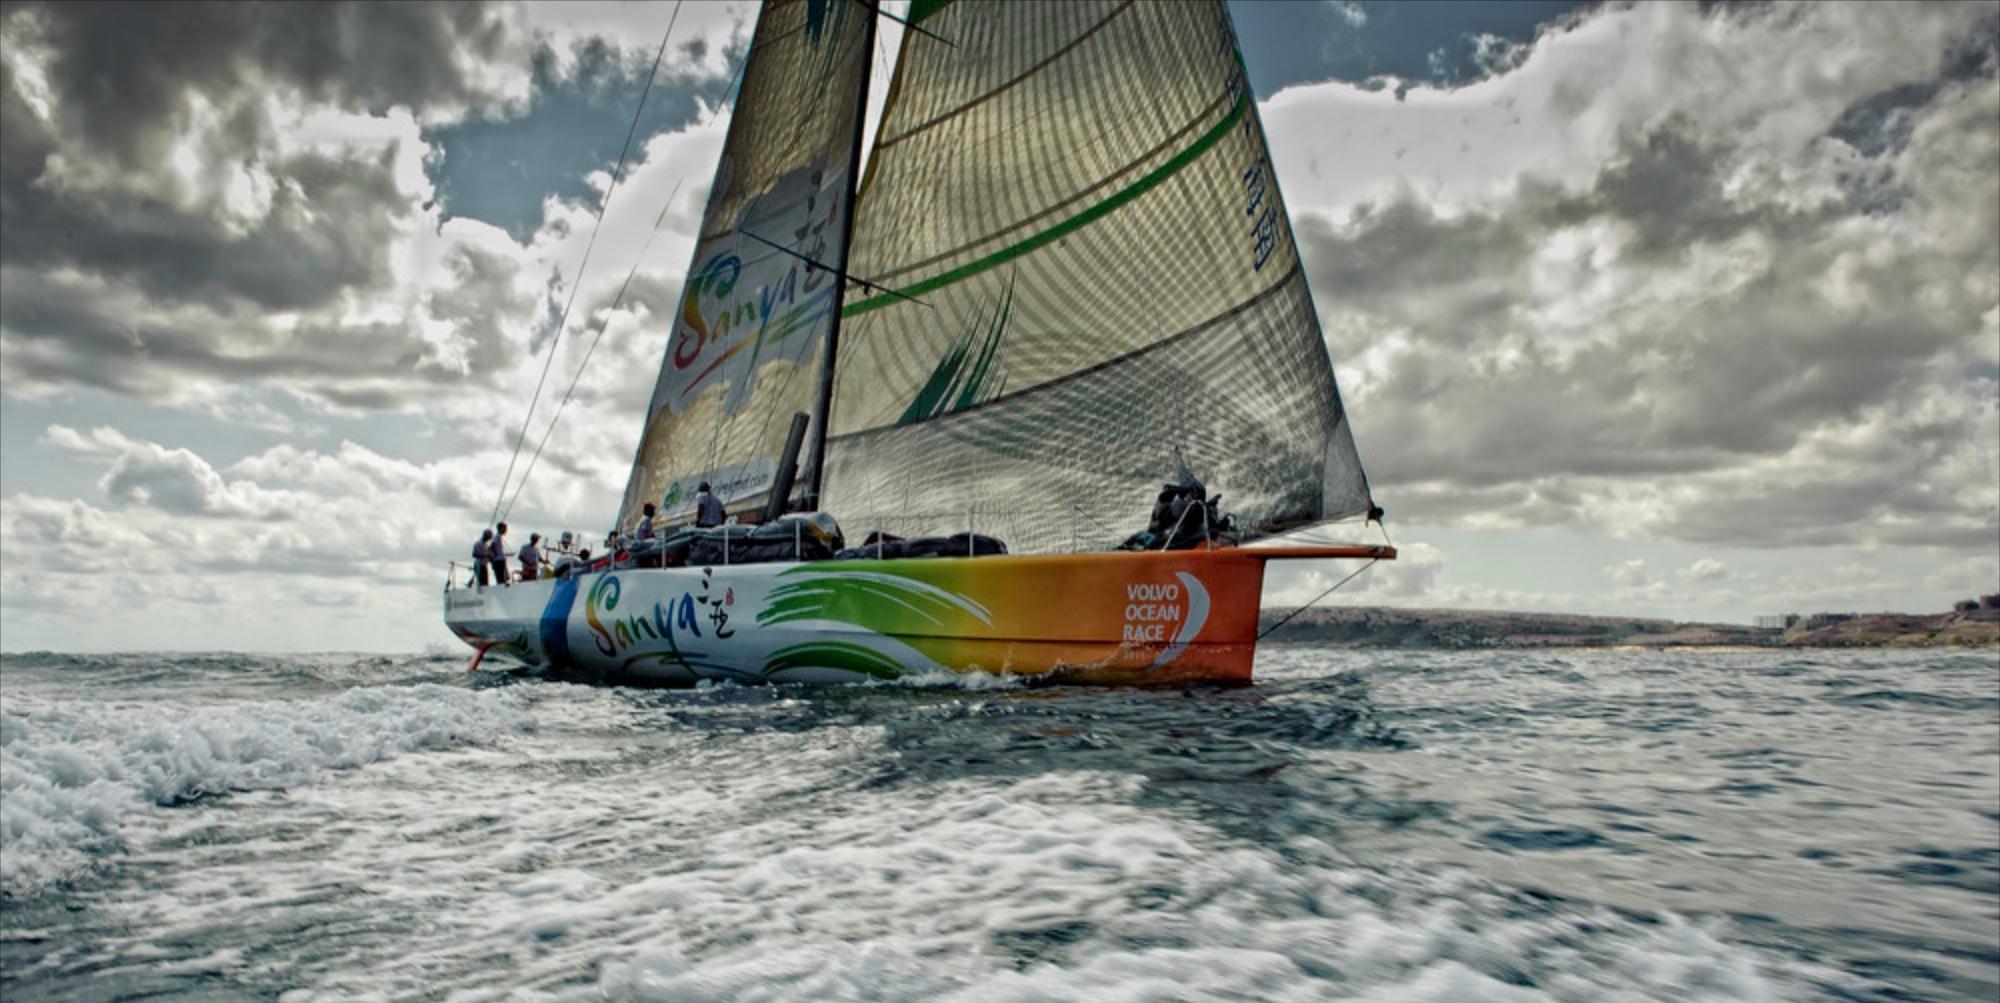 Racing Doyle Sails Italia